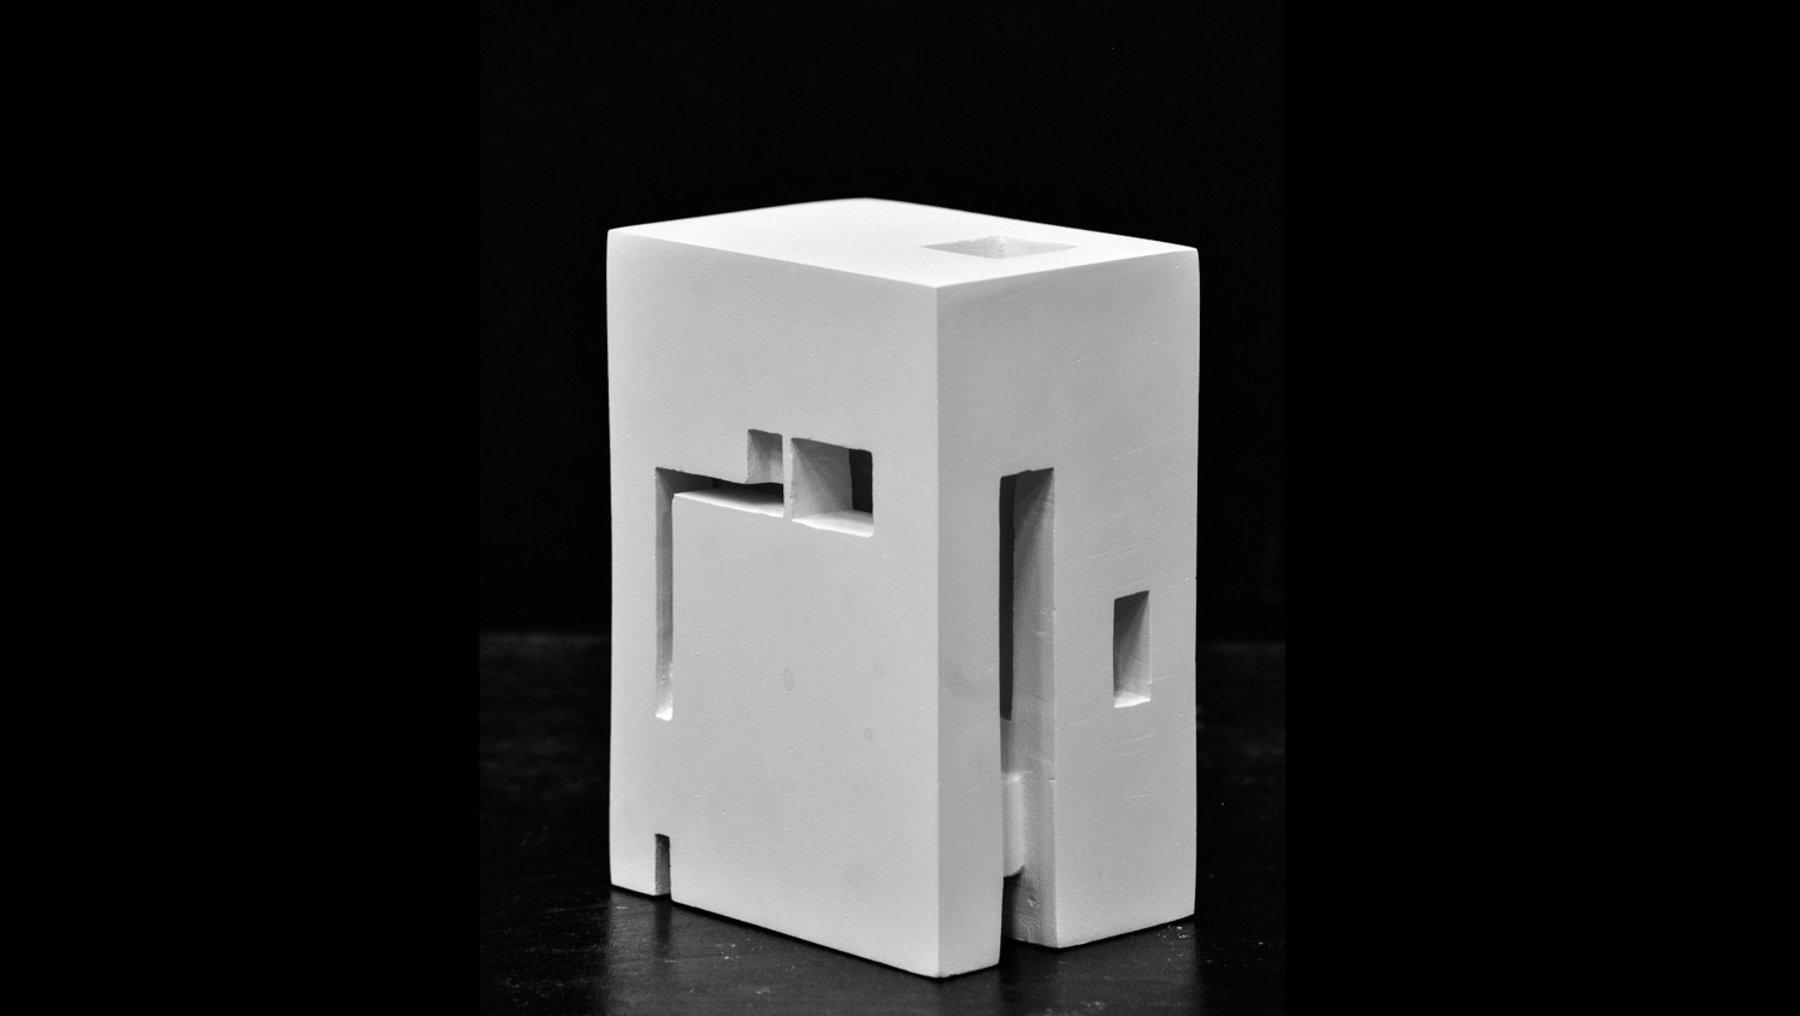 Kubenkomposition - Raum im Körper